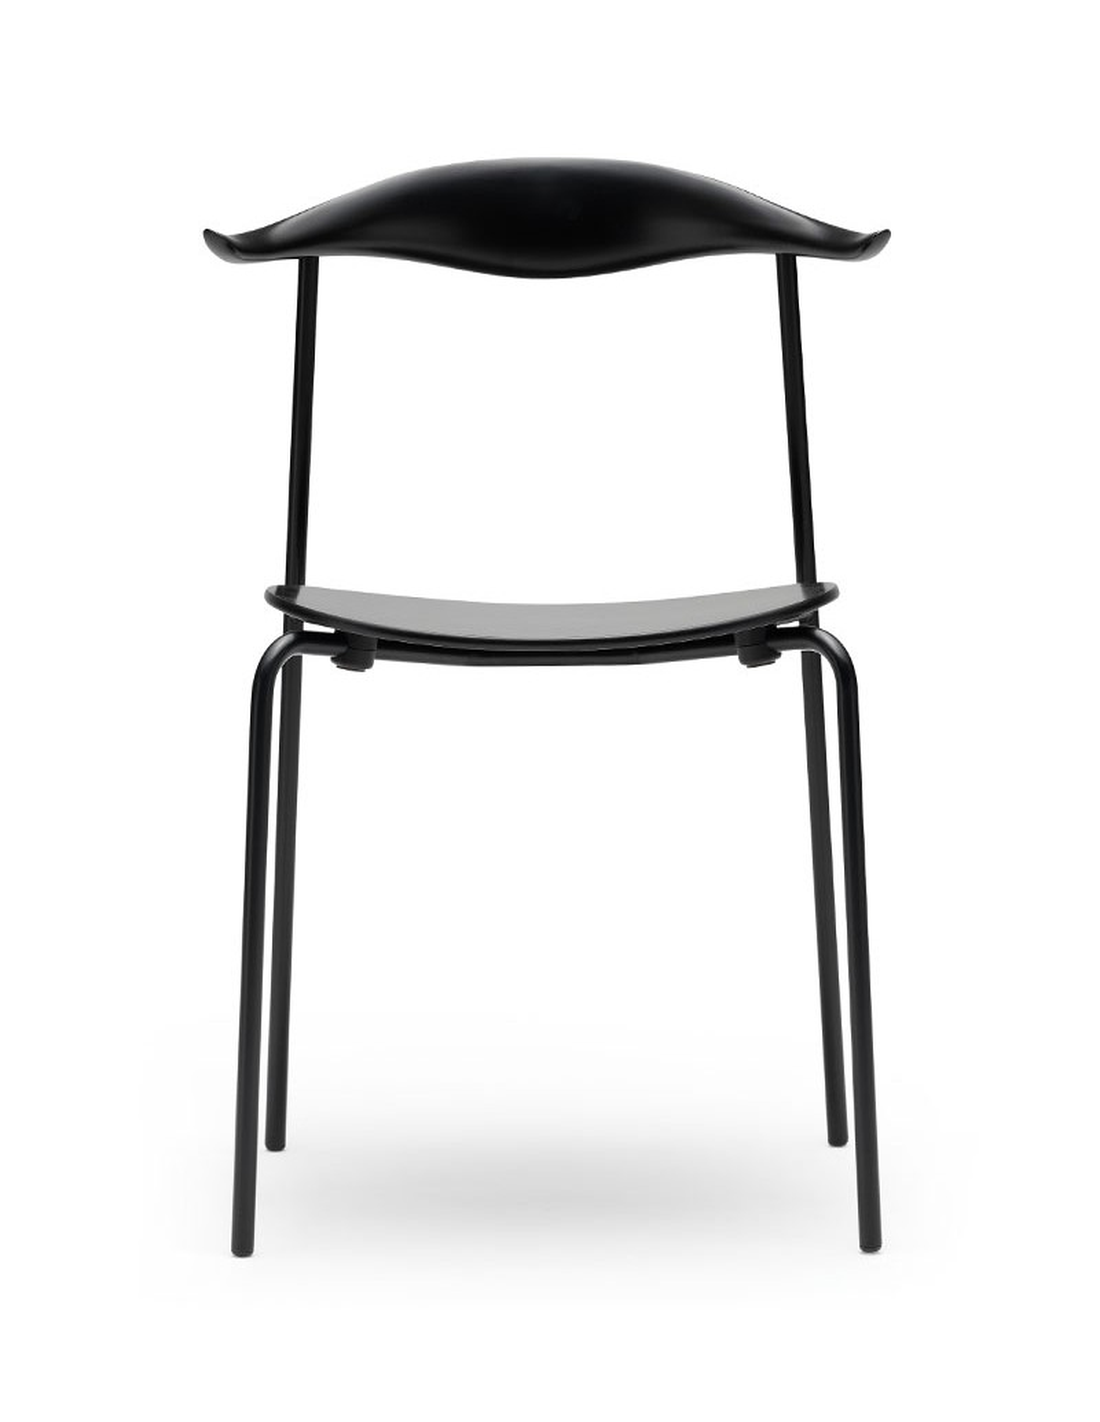 chaise ch 88t design hans j wegner pour carl hansen. Black Bedroom Furniture Sets. Home Design Ideas